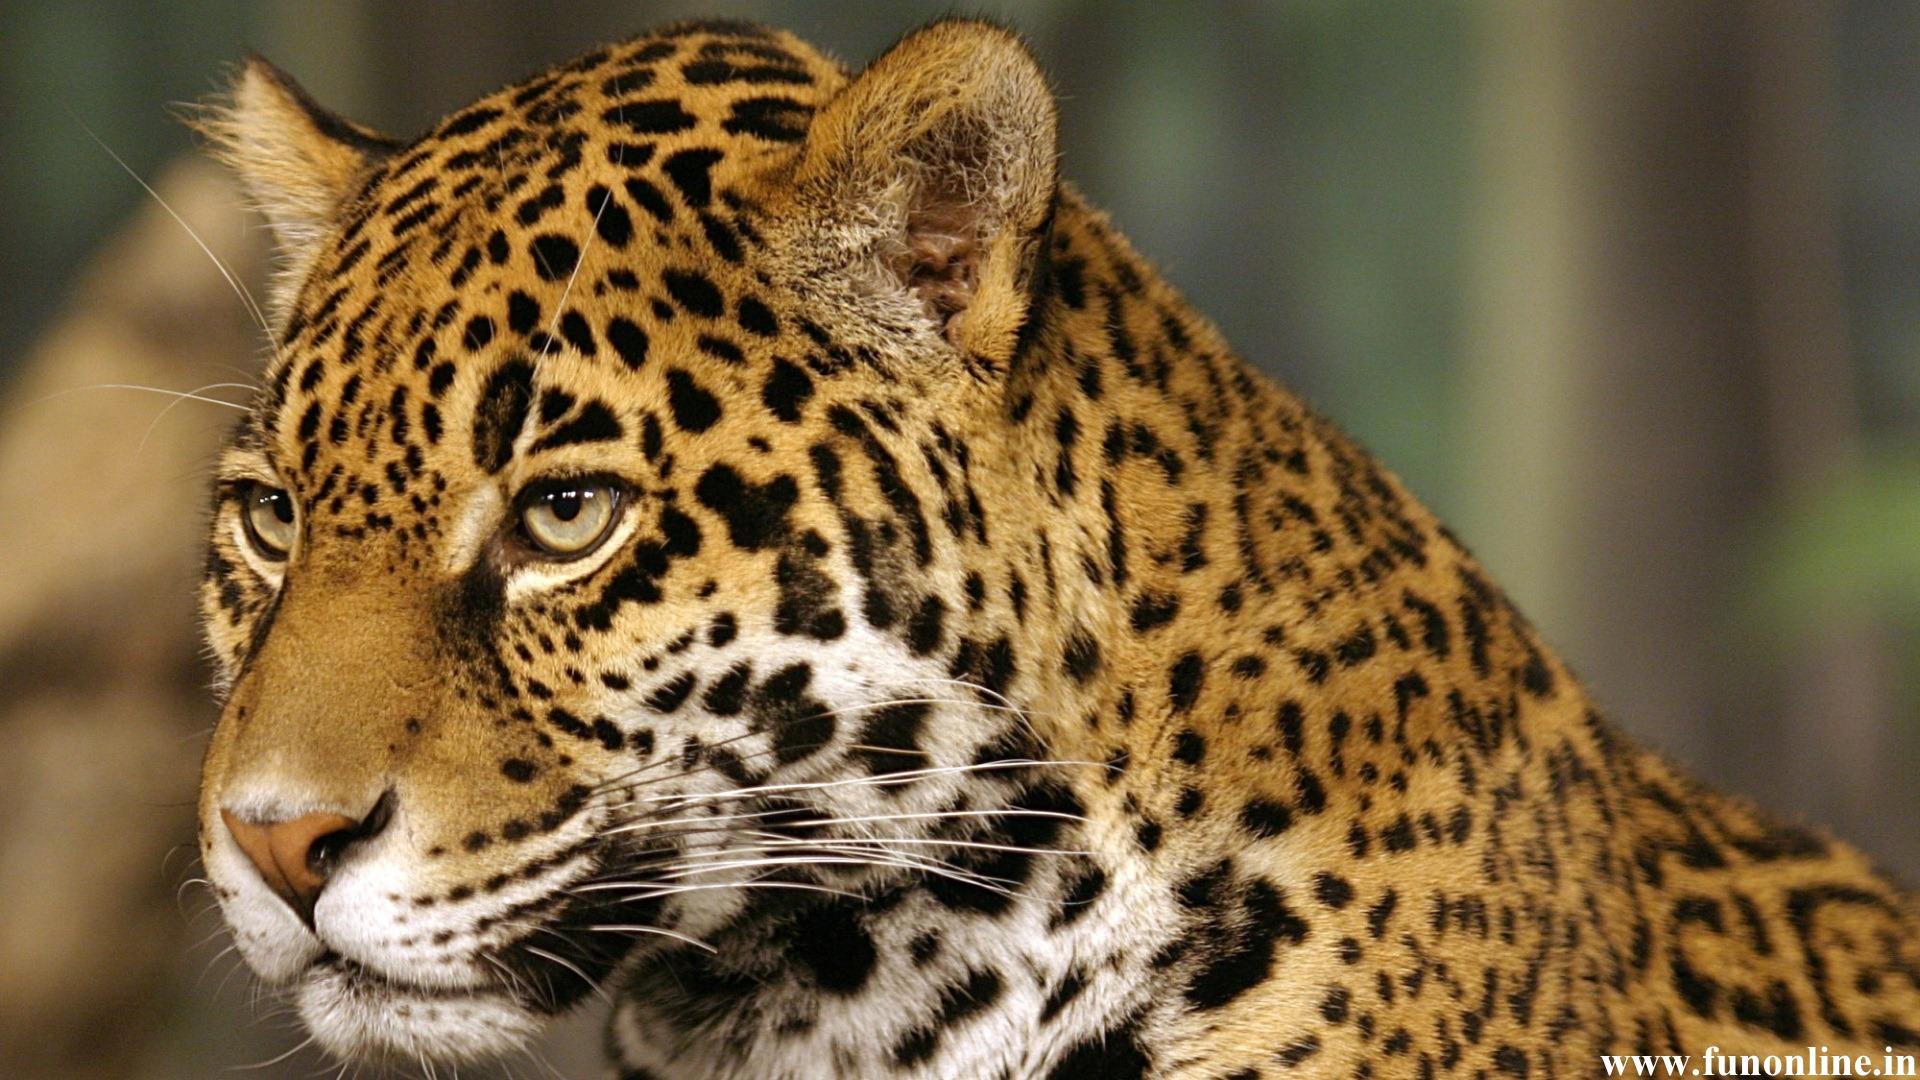 Jaguar Wallpapers Stunning Jaguar HD Wallpapers for Download